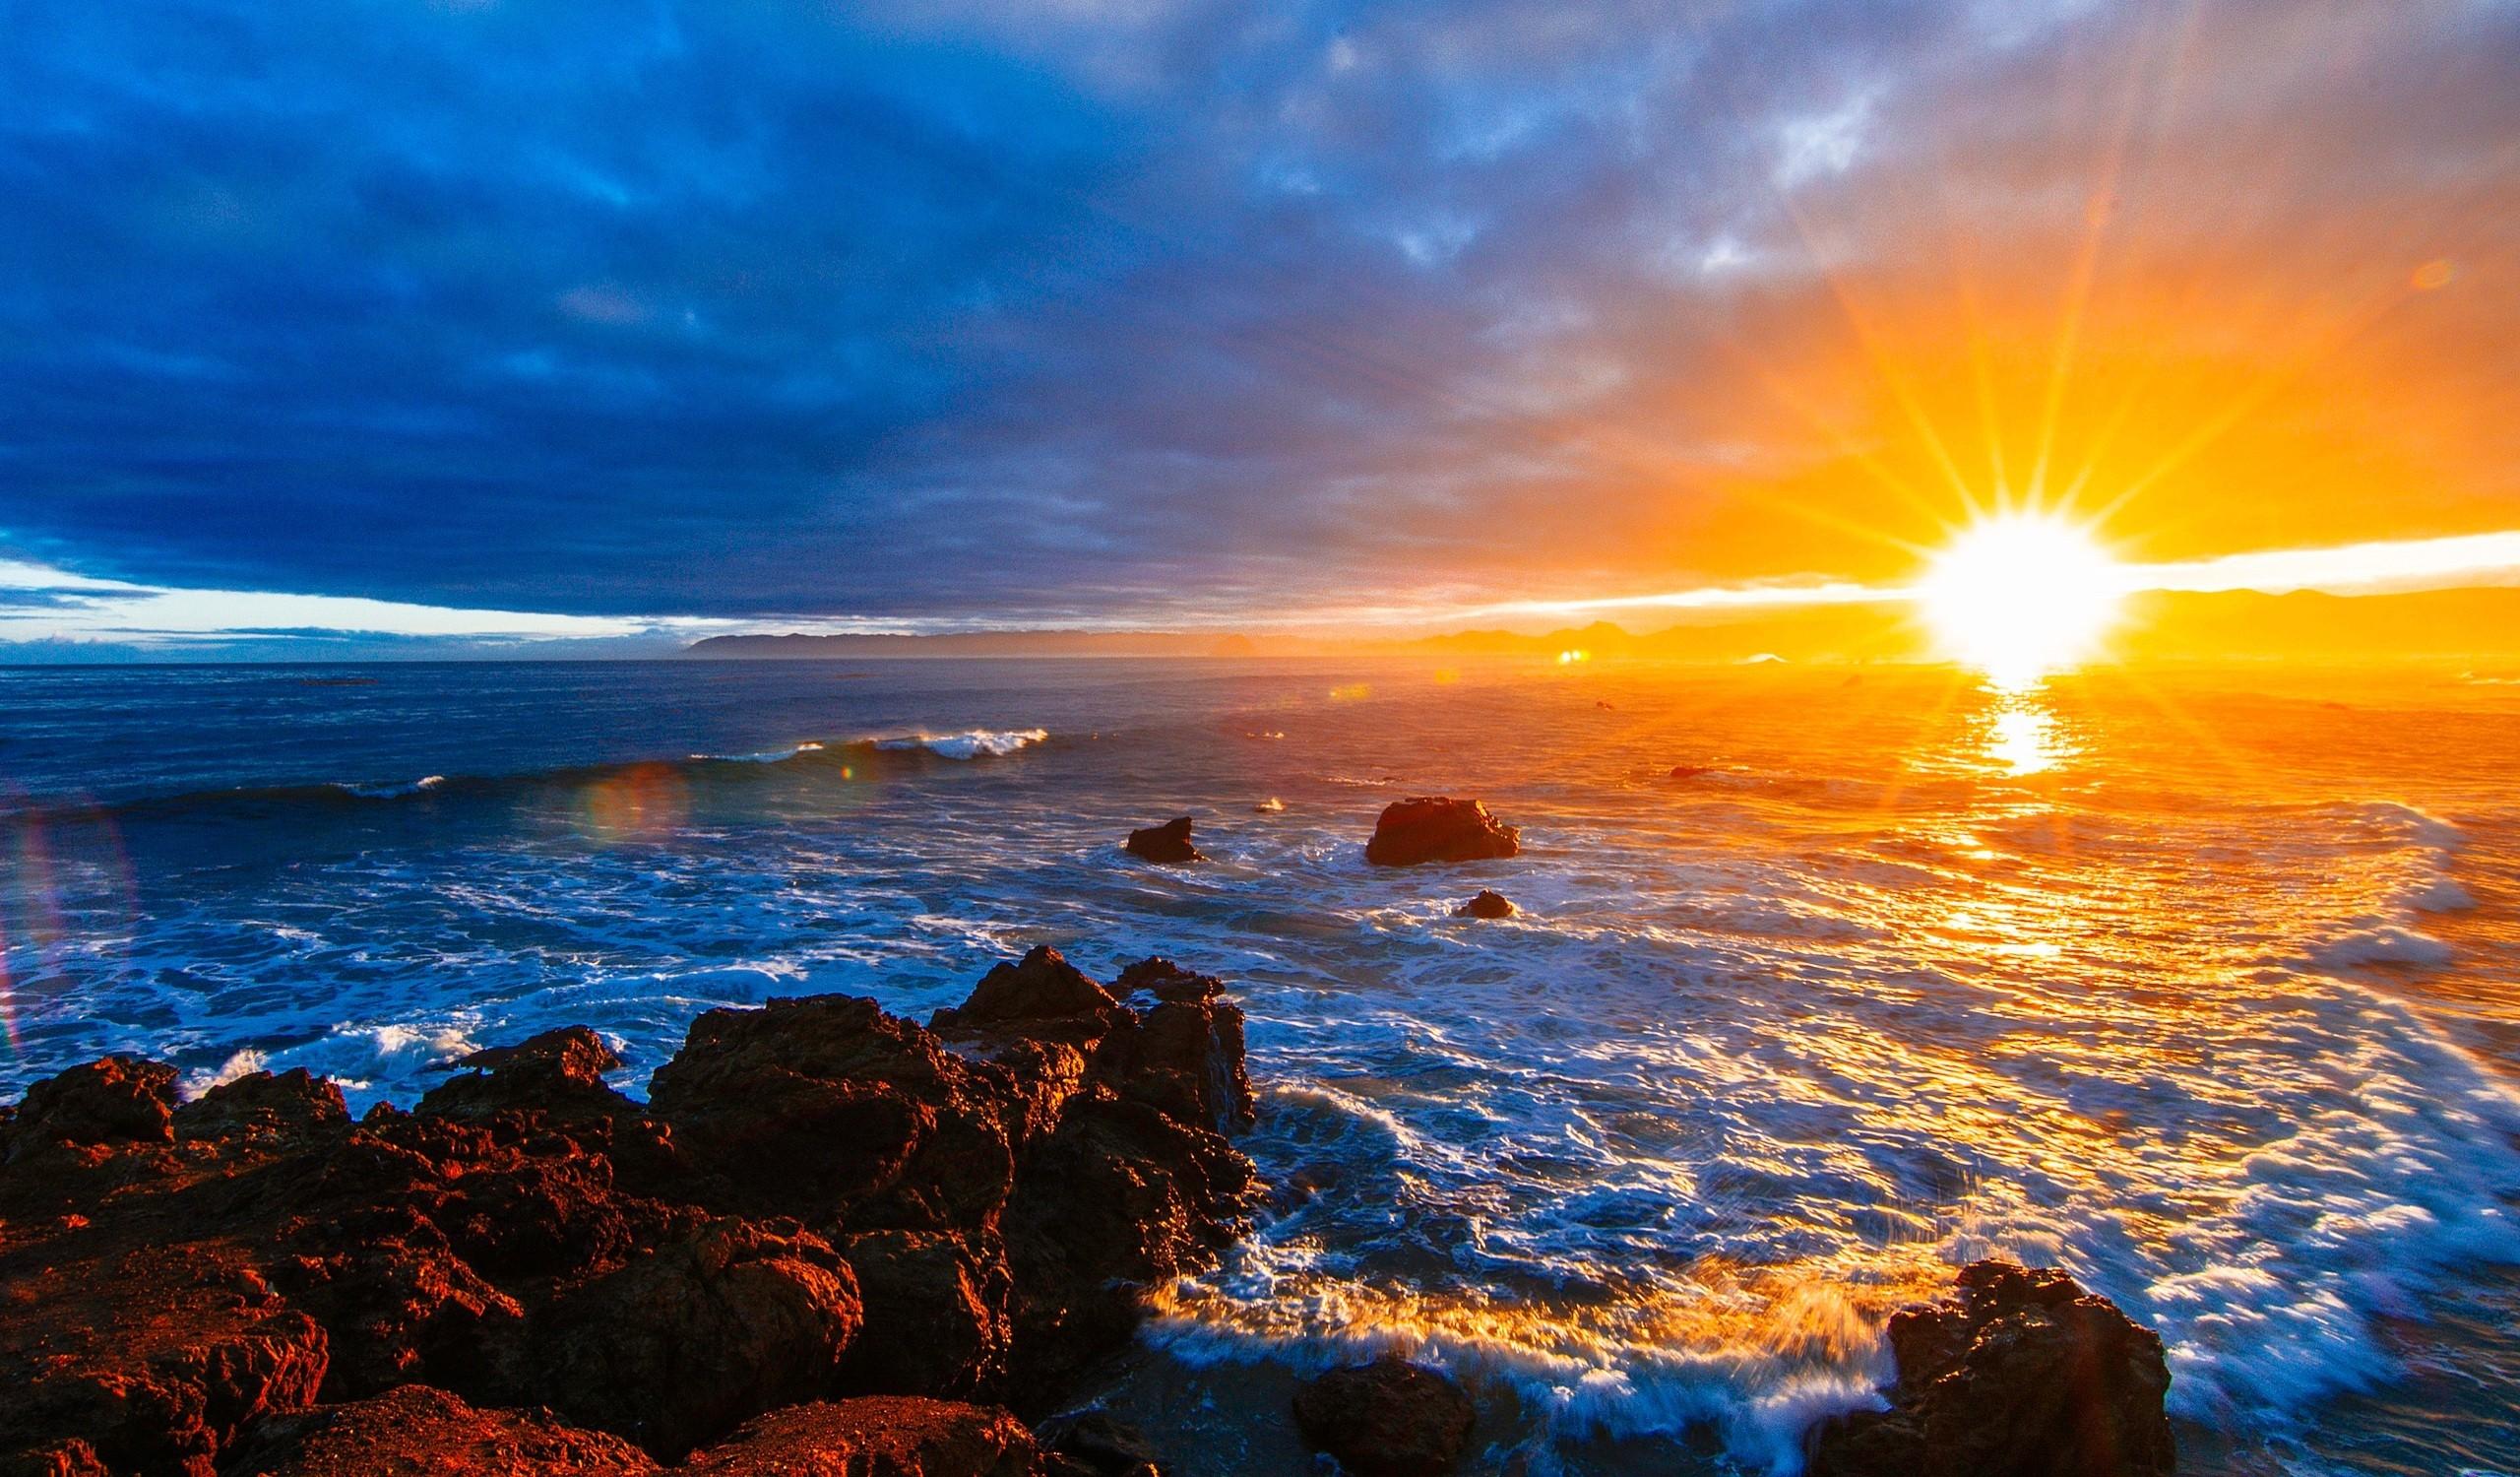 Ocean summer sunset photo